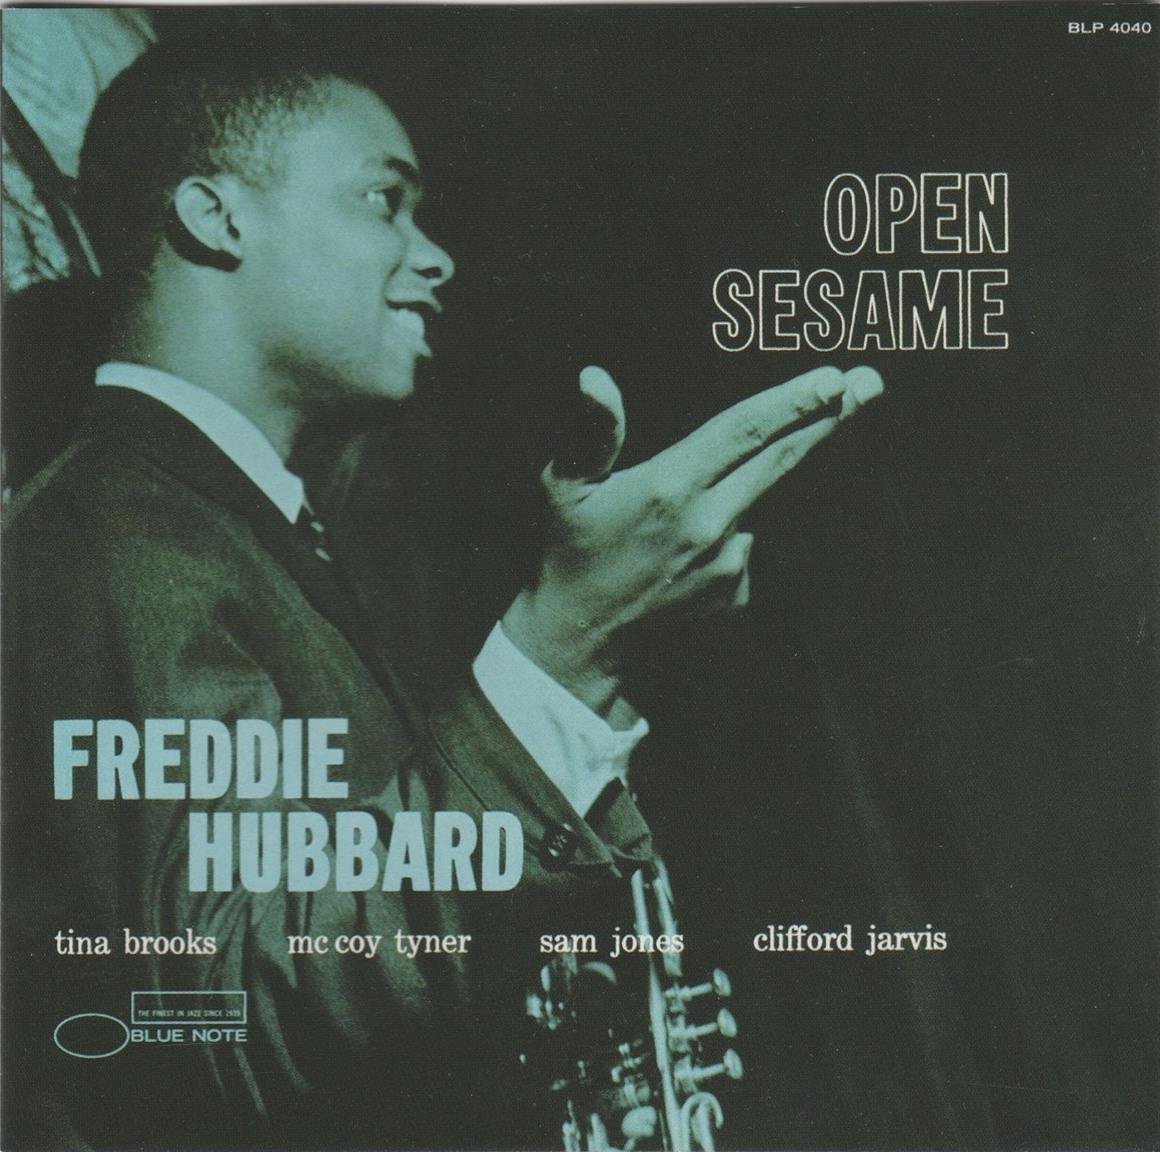 Freddie Hubbard - Open Sesame